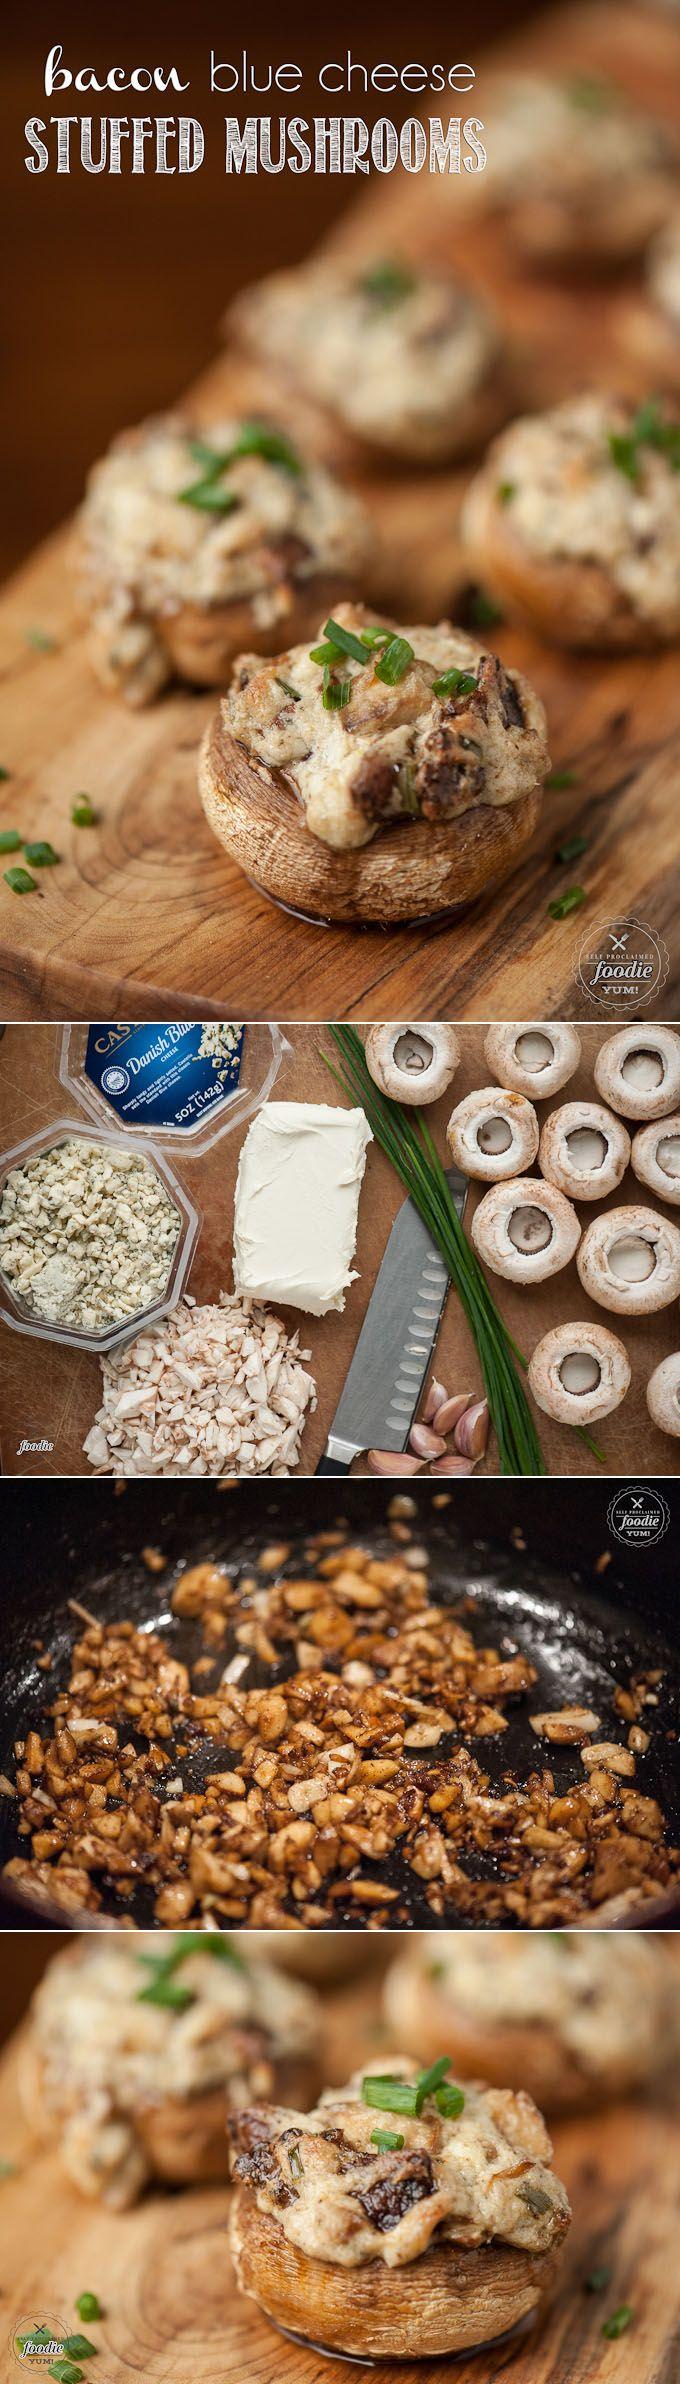 Bacon Blue Cheese Stuffed Mushrooms